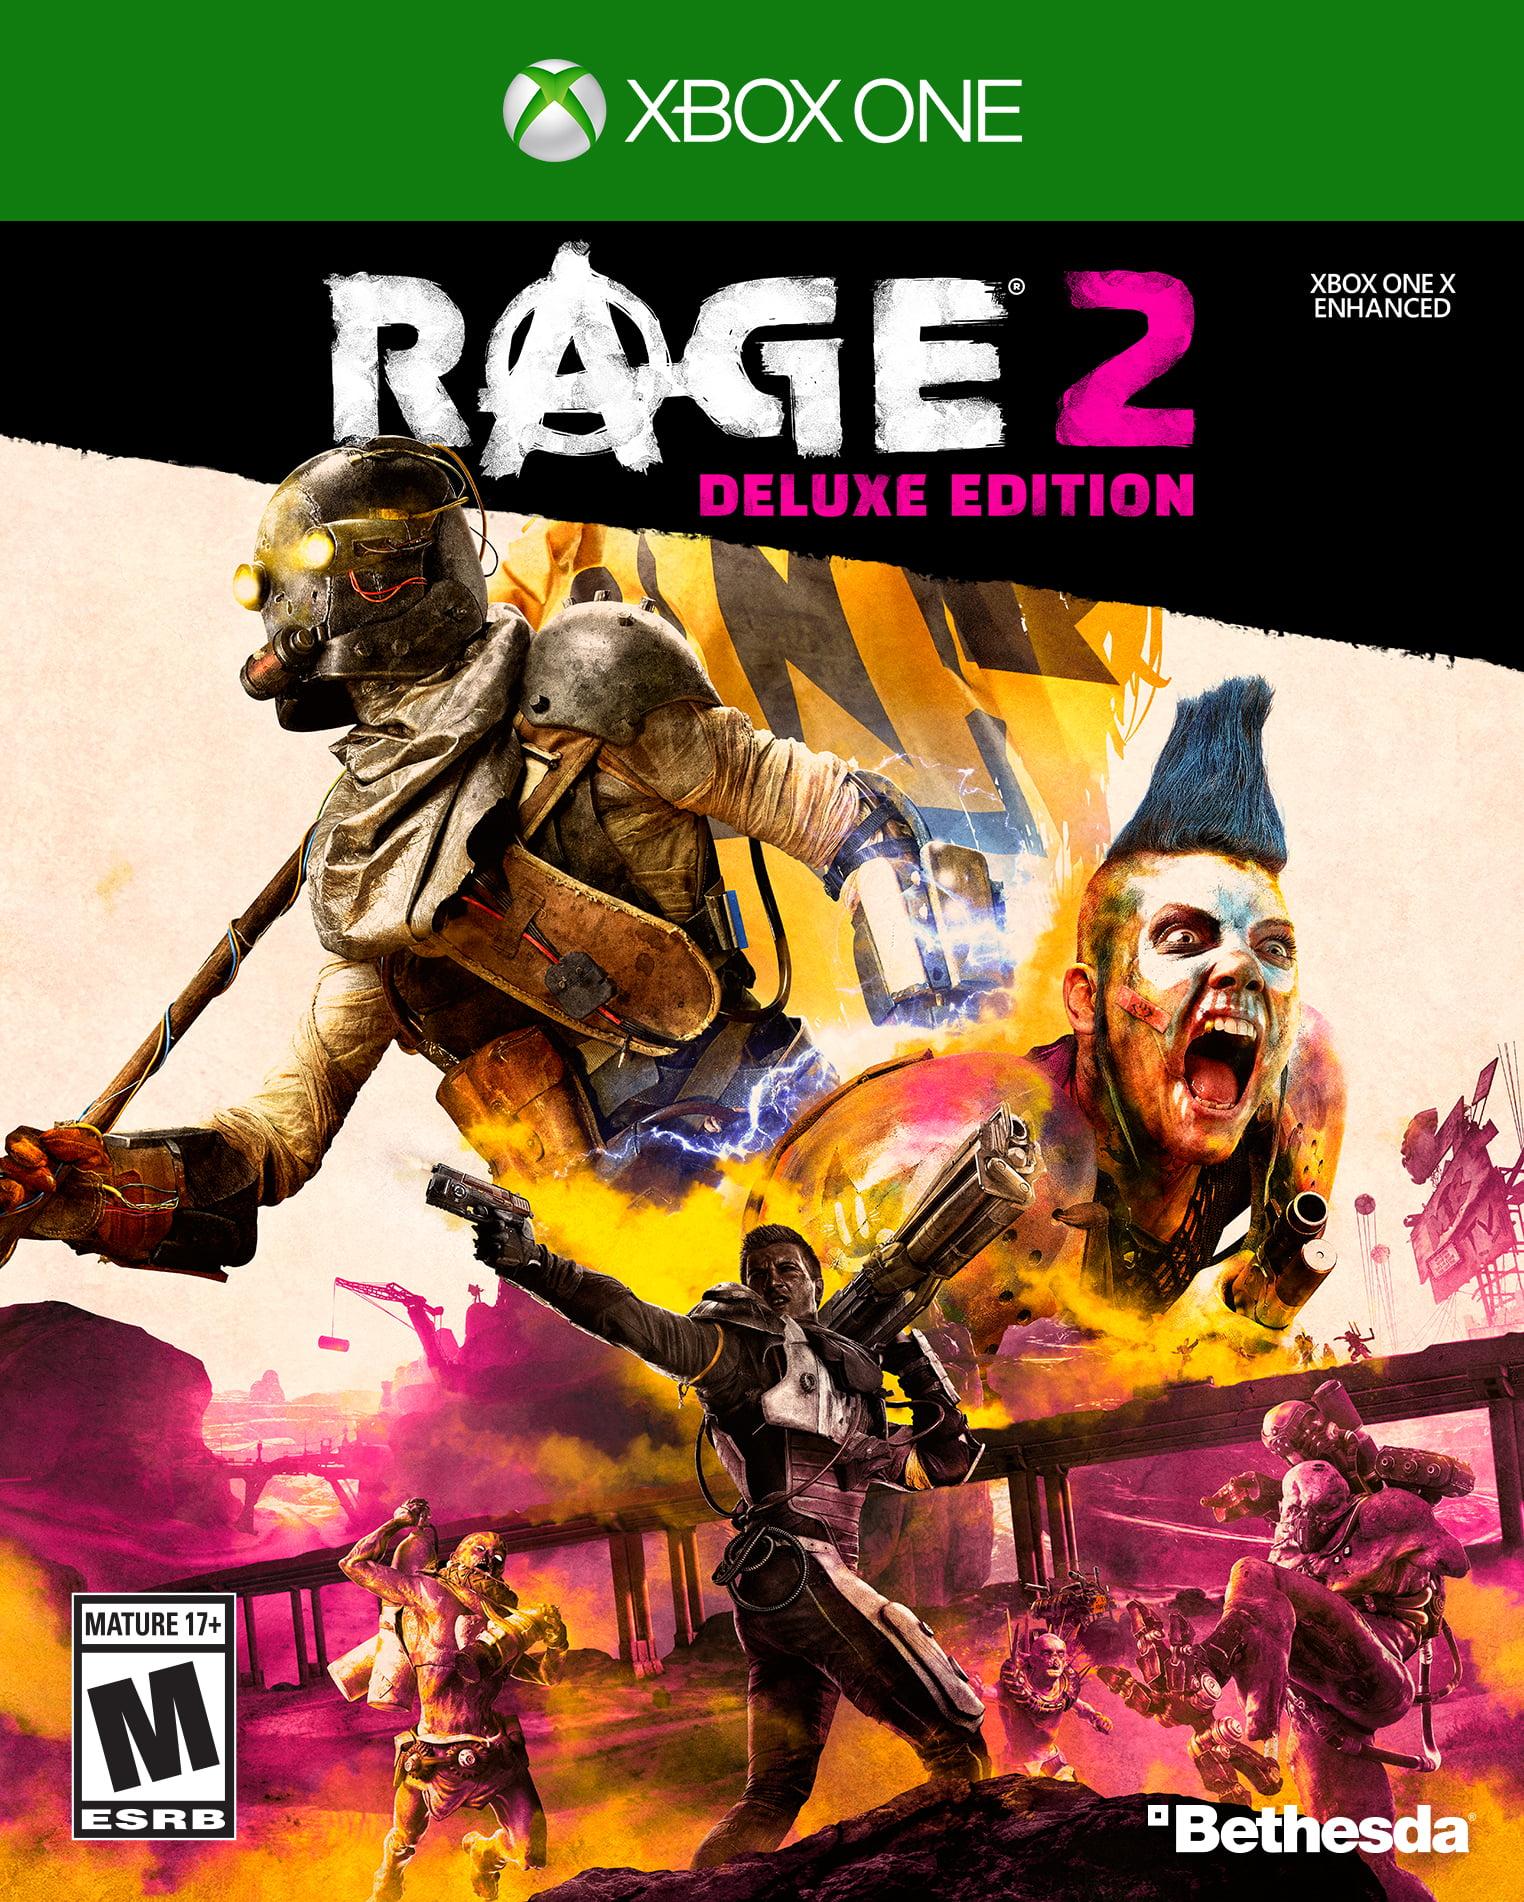 Rage 2 Deluxe Edition, Bethesda, Xbox One, 093155174252